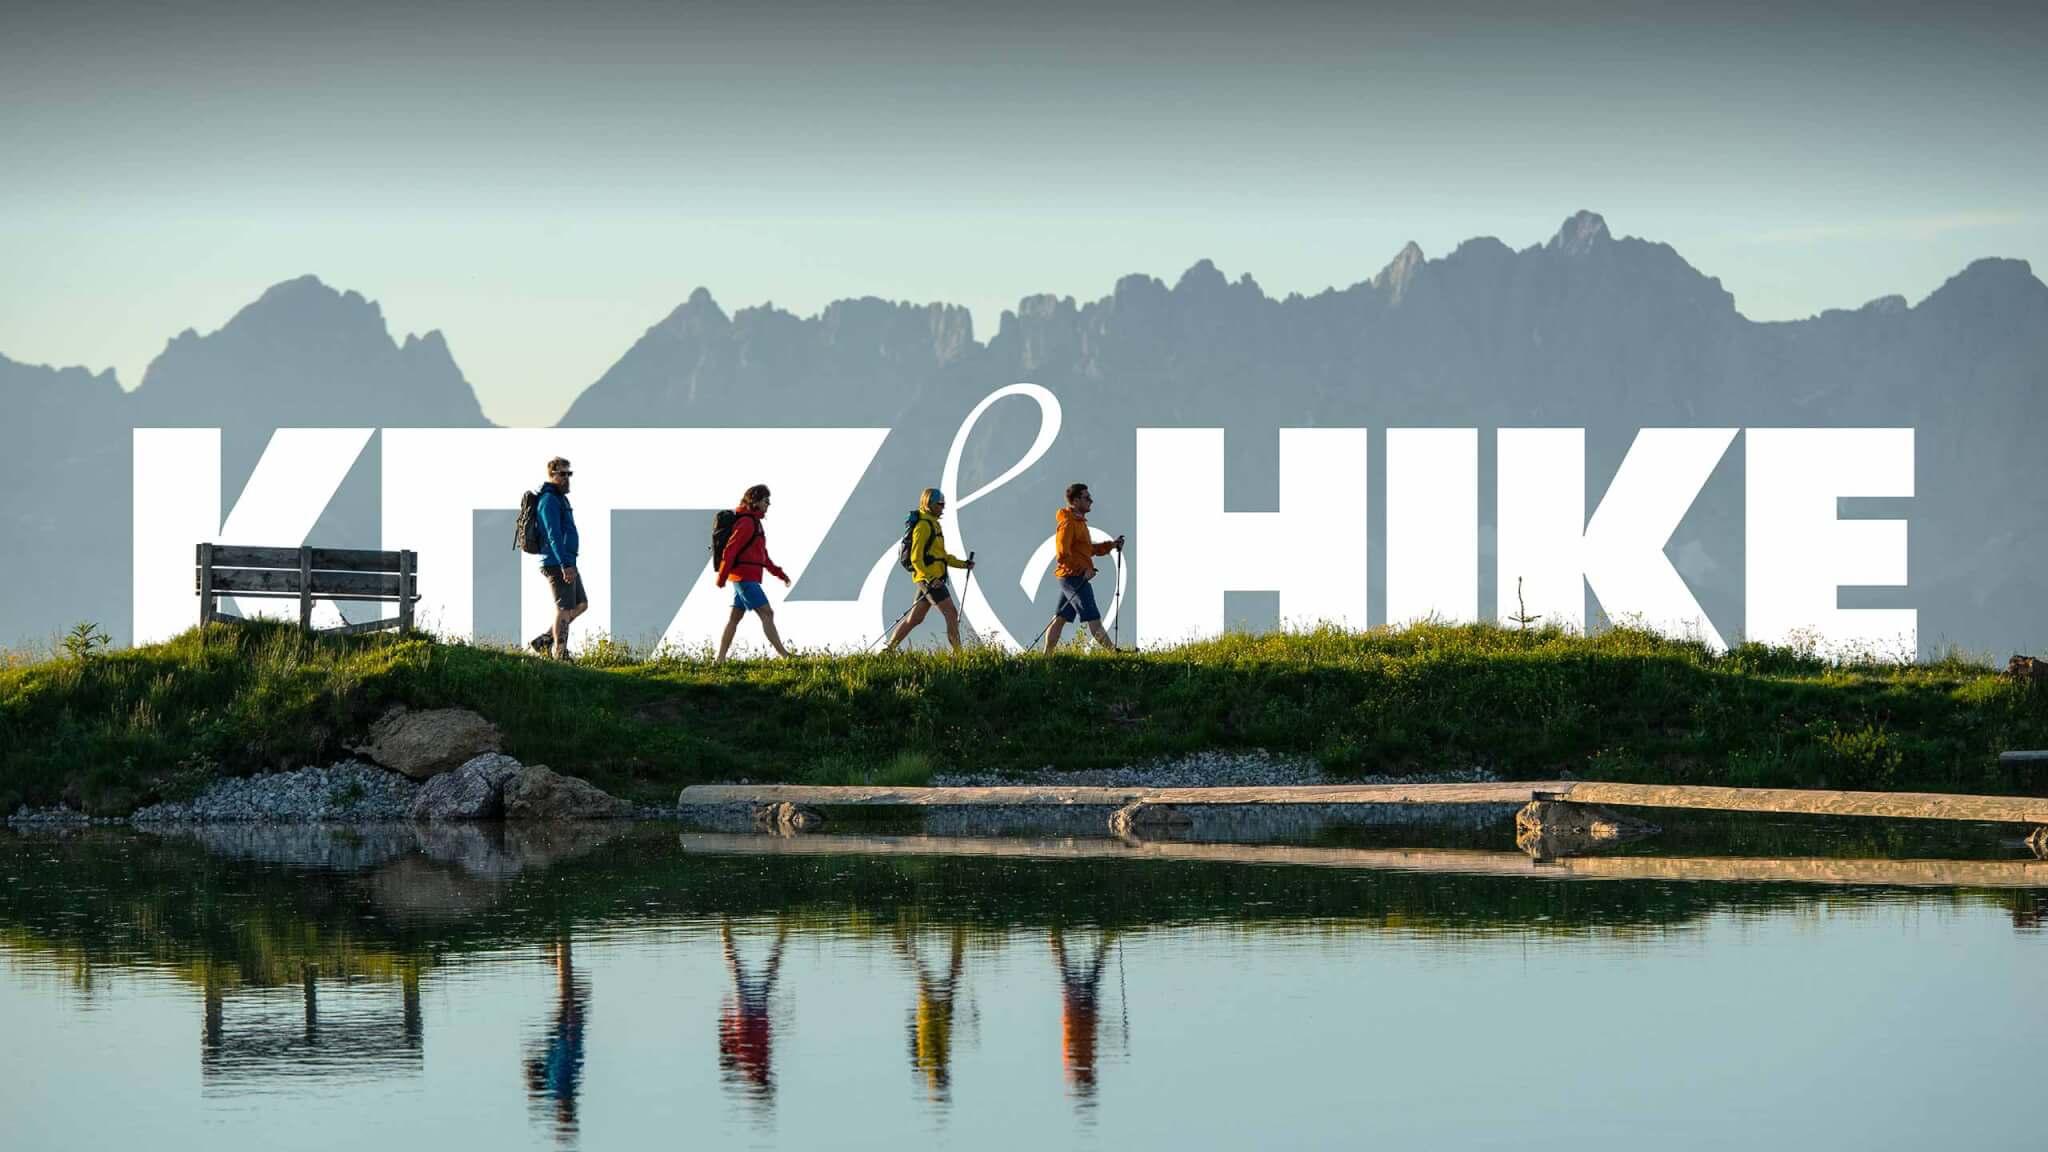 Kitzsport Kitz&Hike Kitzbühel